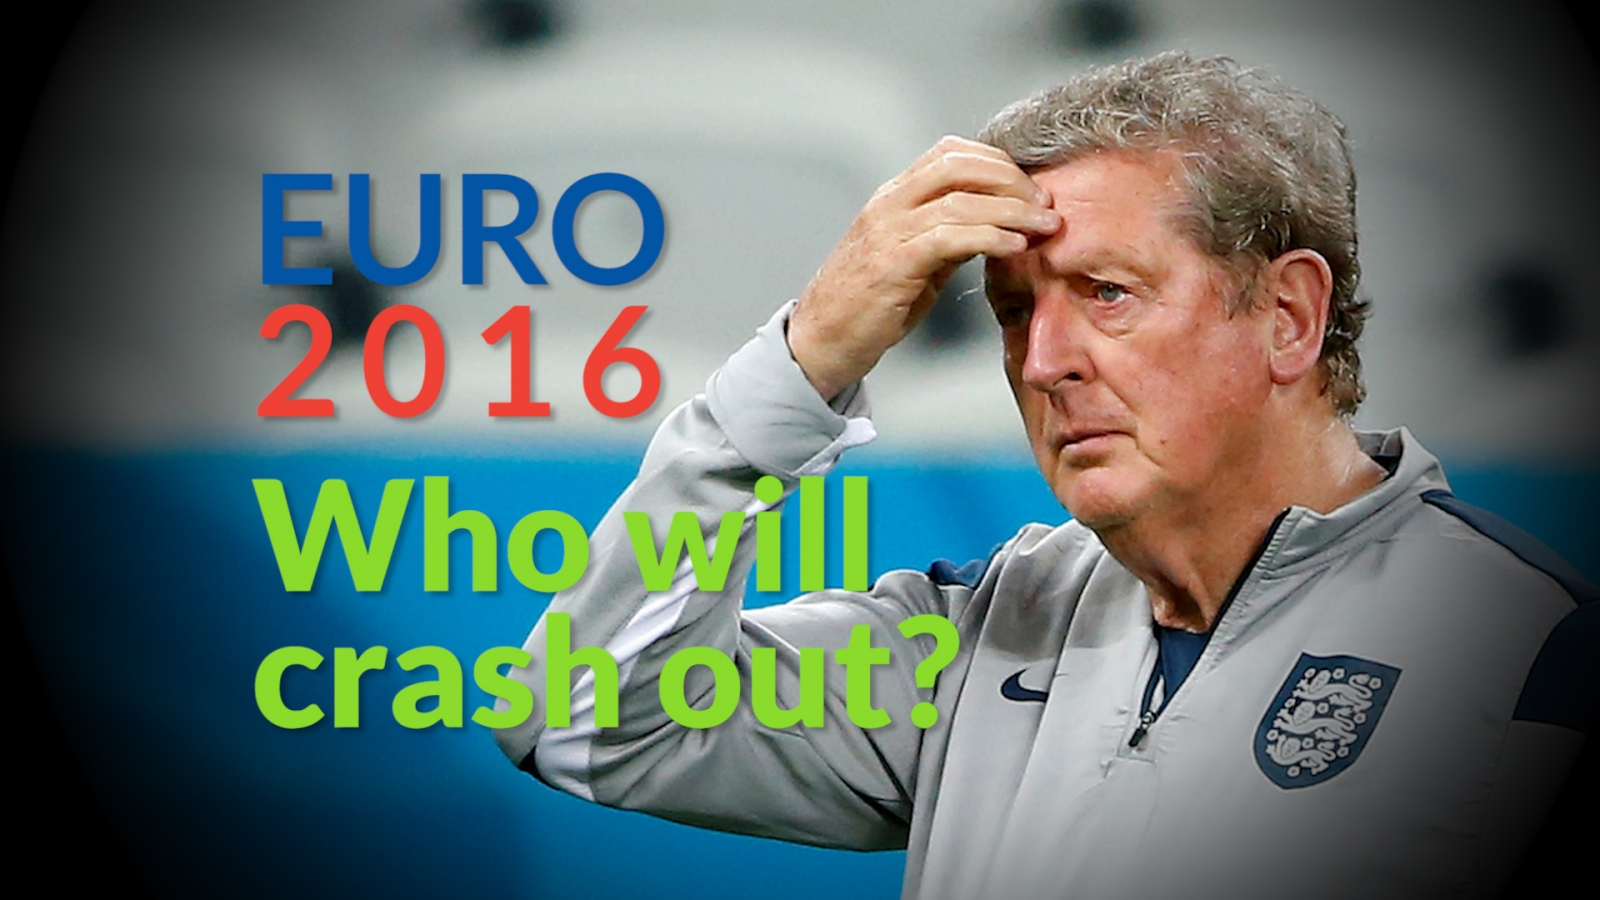 EURO 2016 Flops